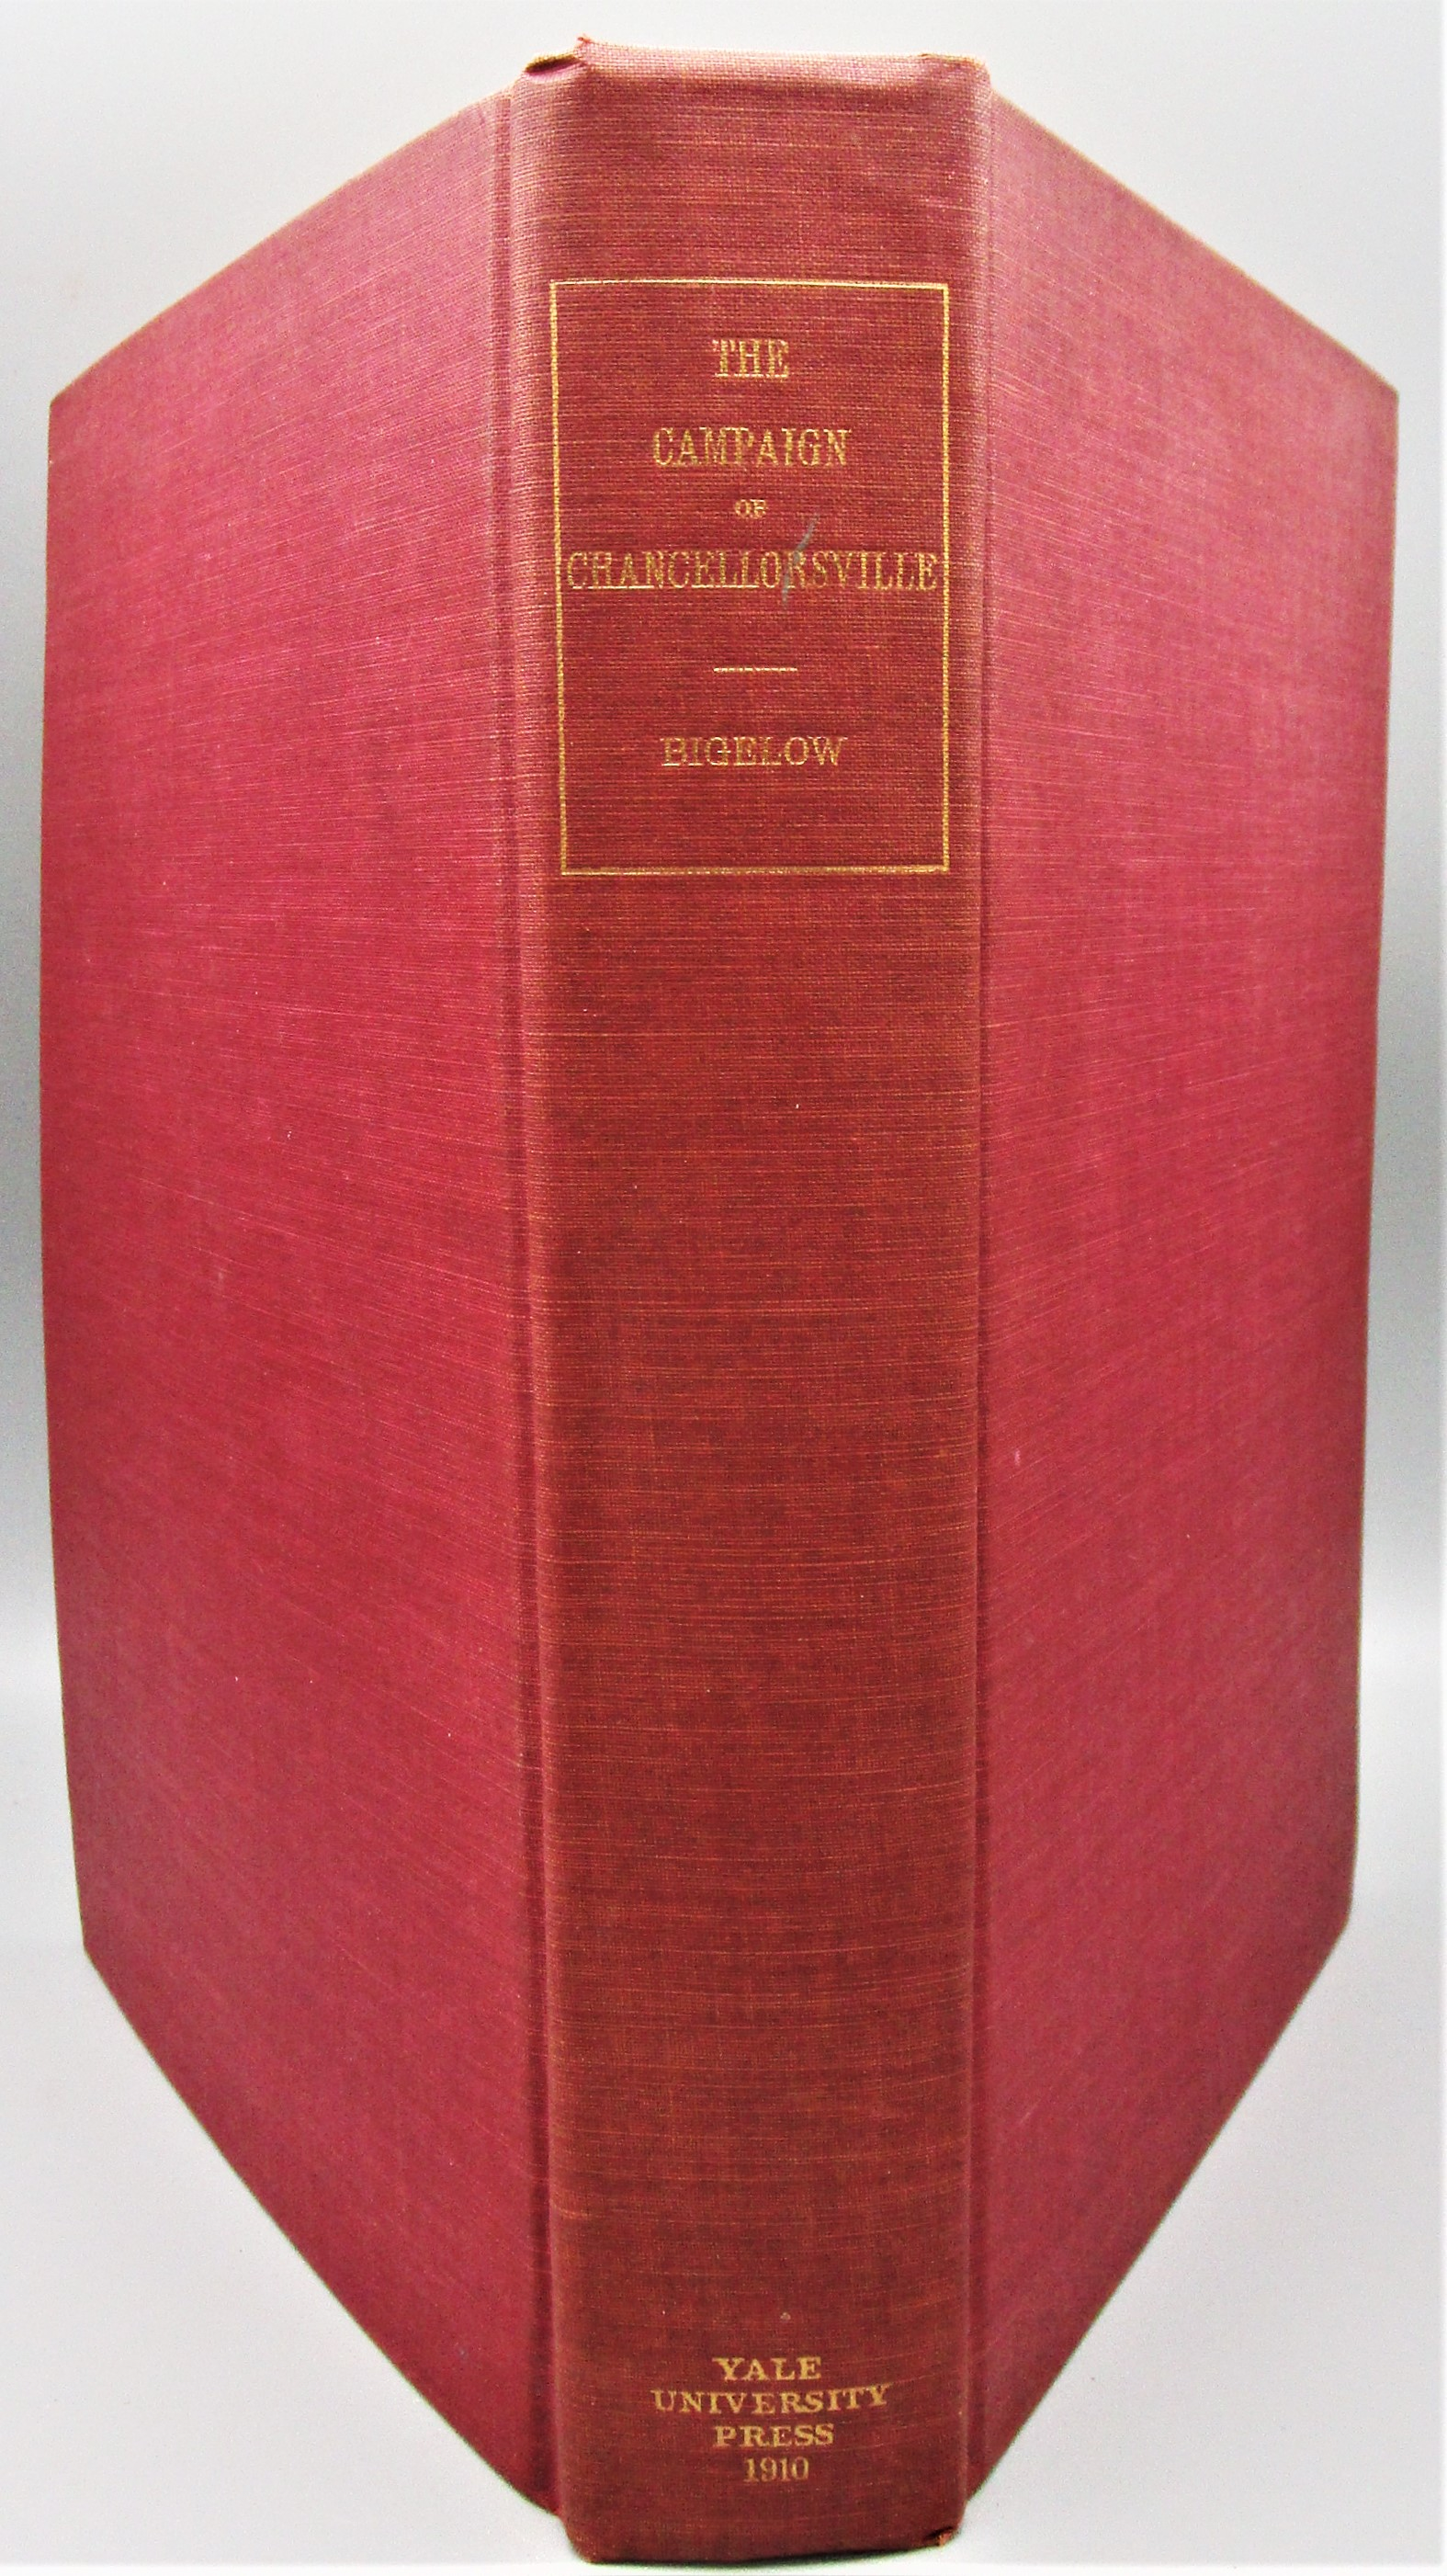 CAMPAIGN OF CHANCELLORSVILLE, by John Bigelow - 1910 [Ltd Ed]